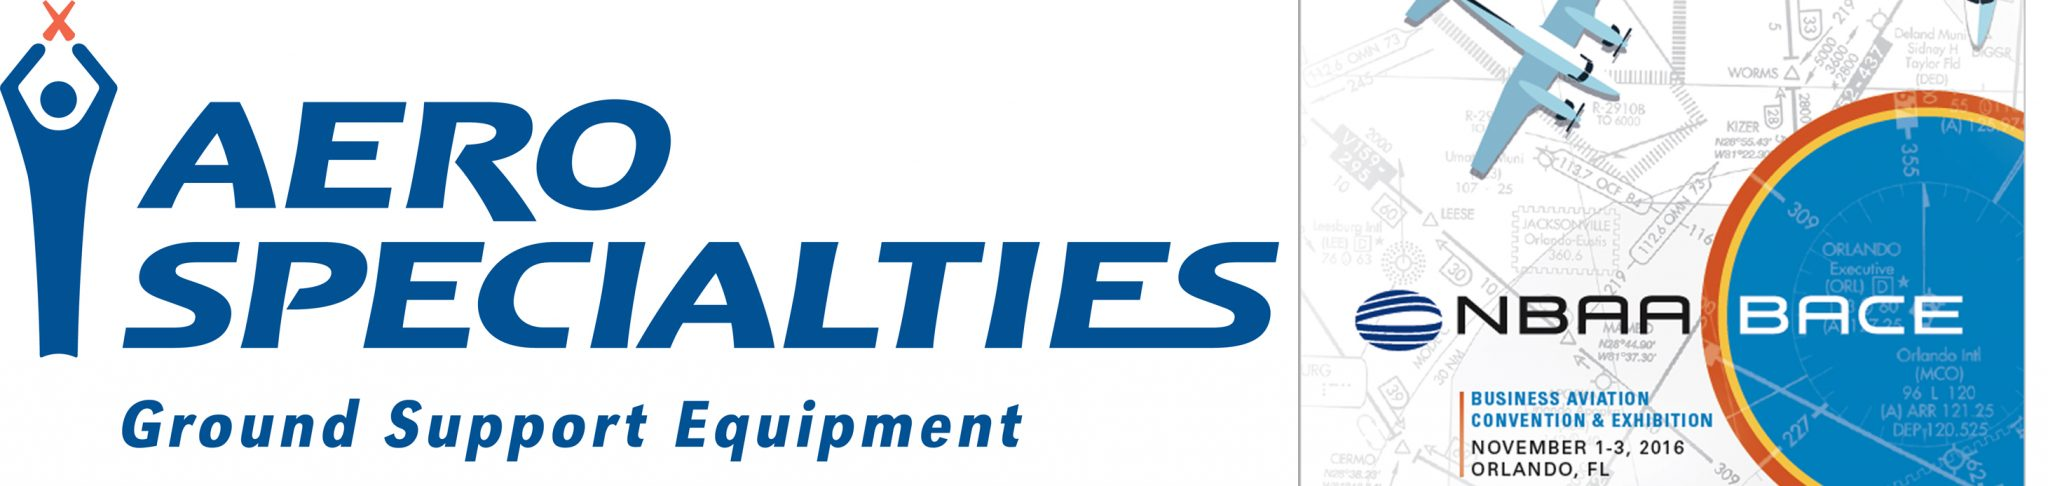 Aero Specialties - Ground Support Equipment